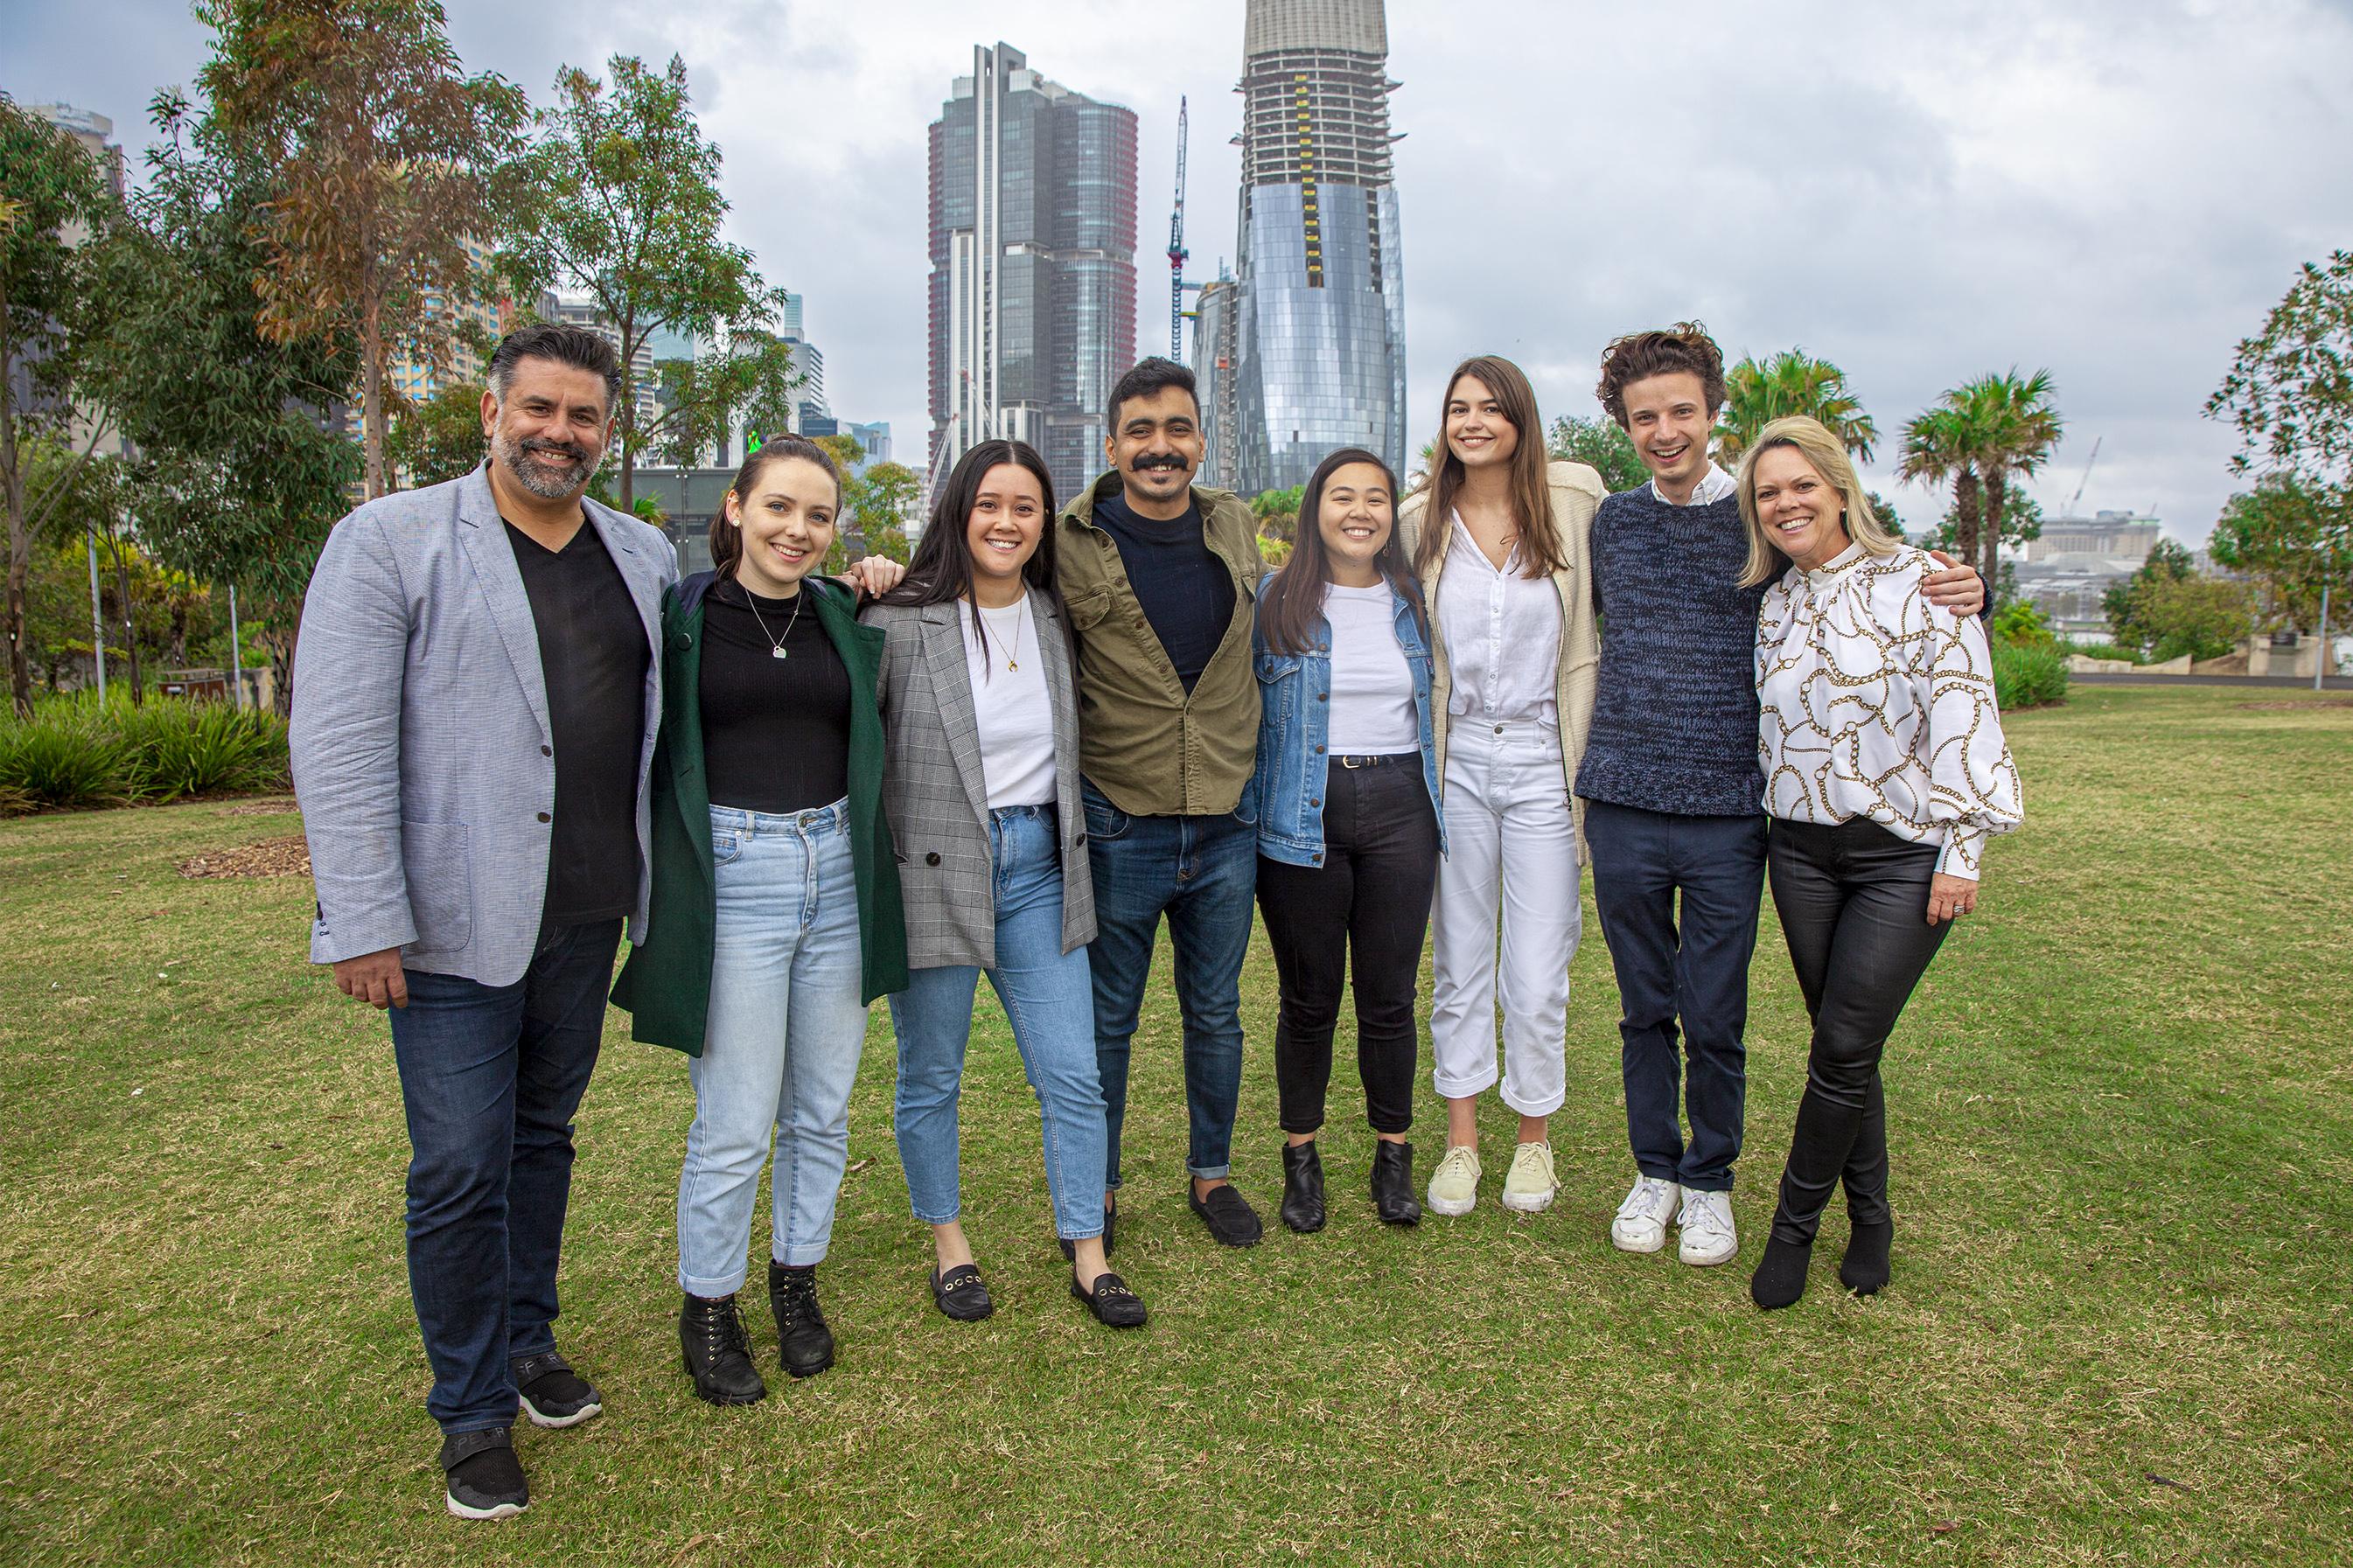 Ogilvy Sydney Opens Applications For Annual Goliath Program